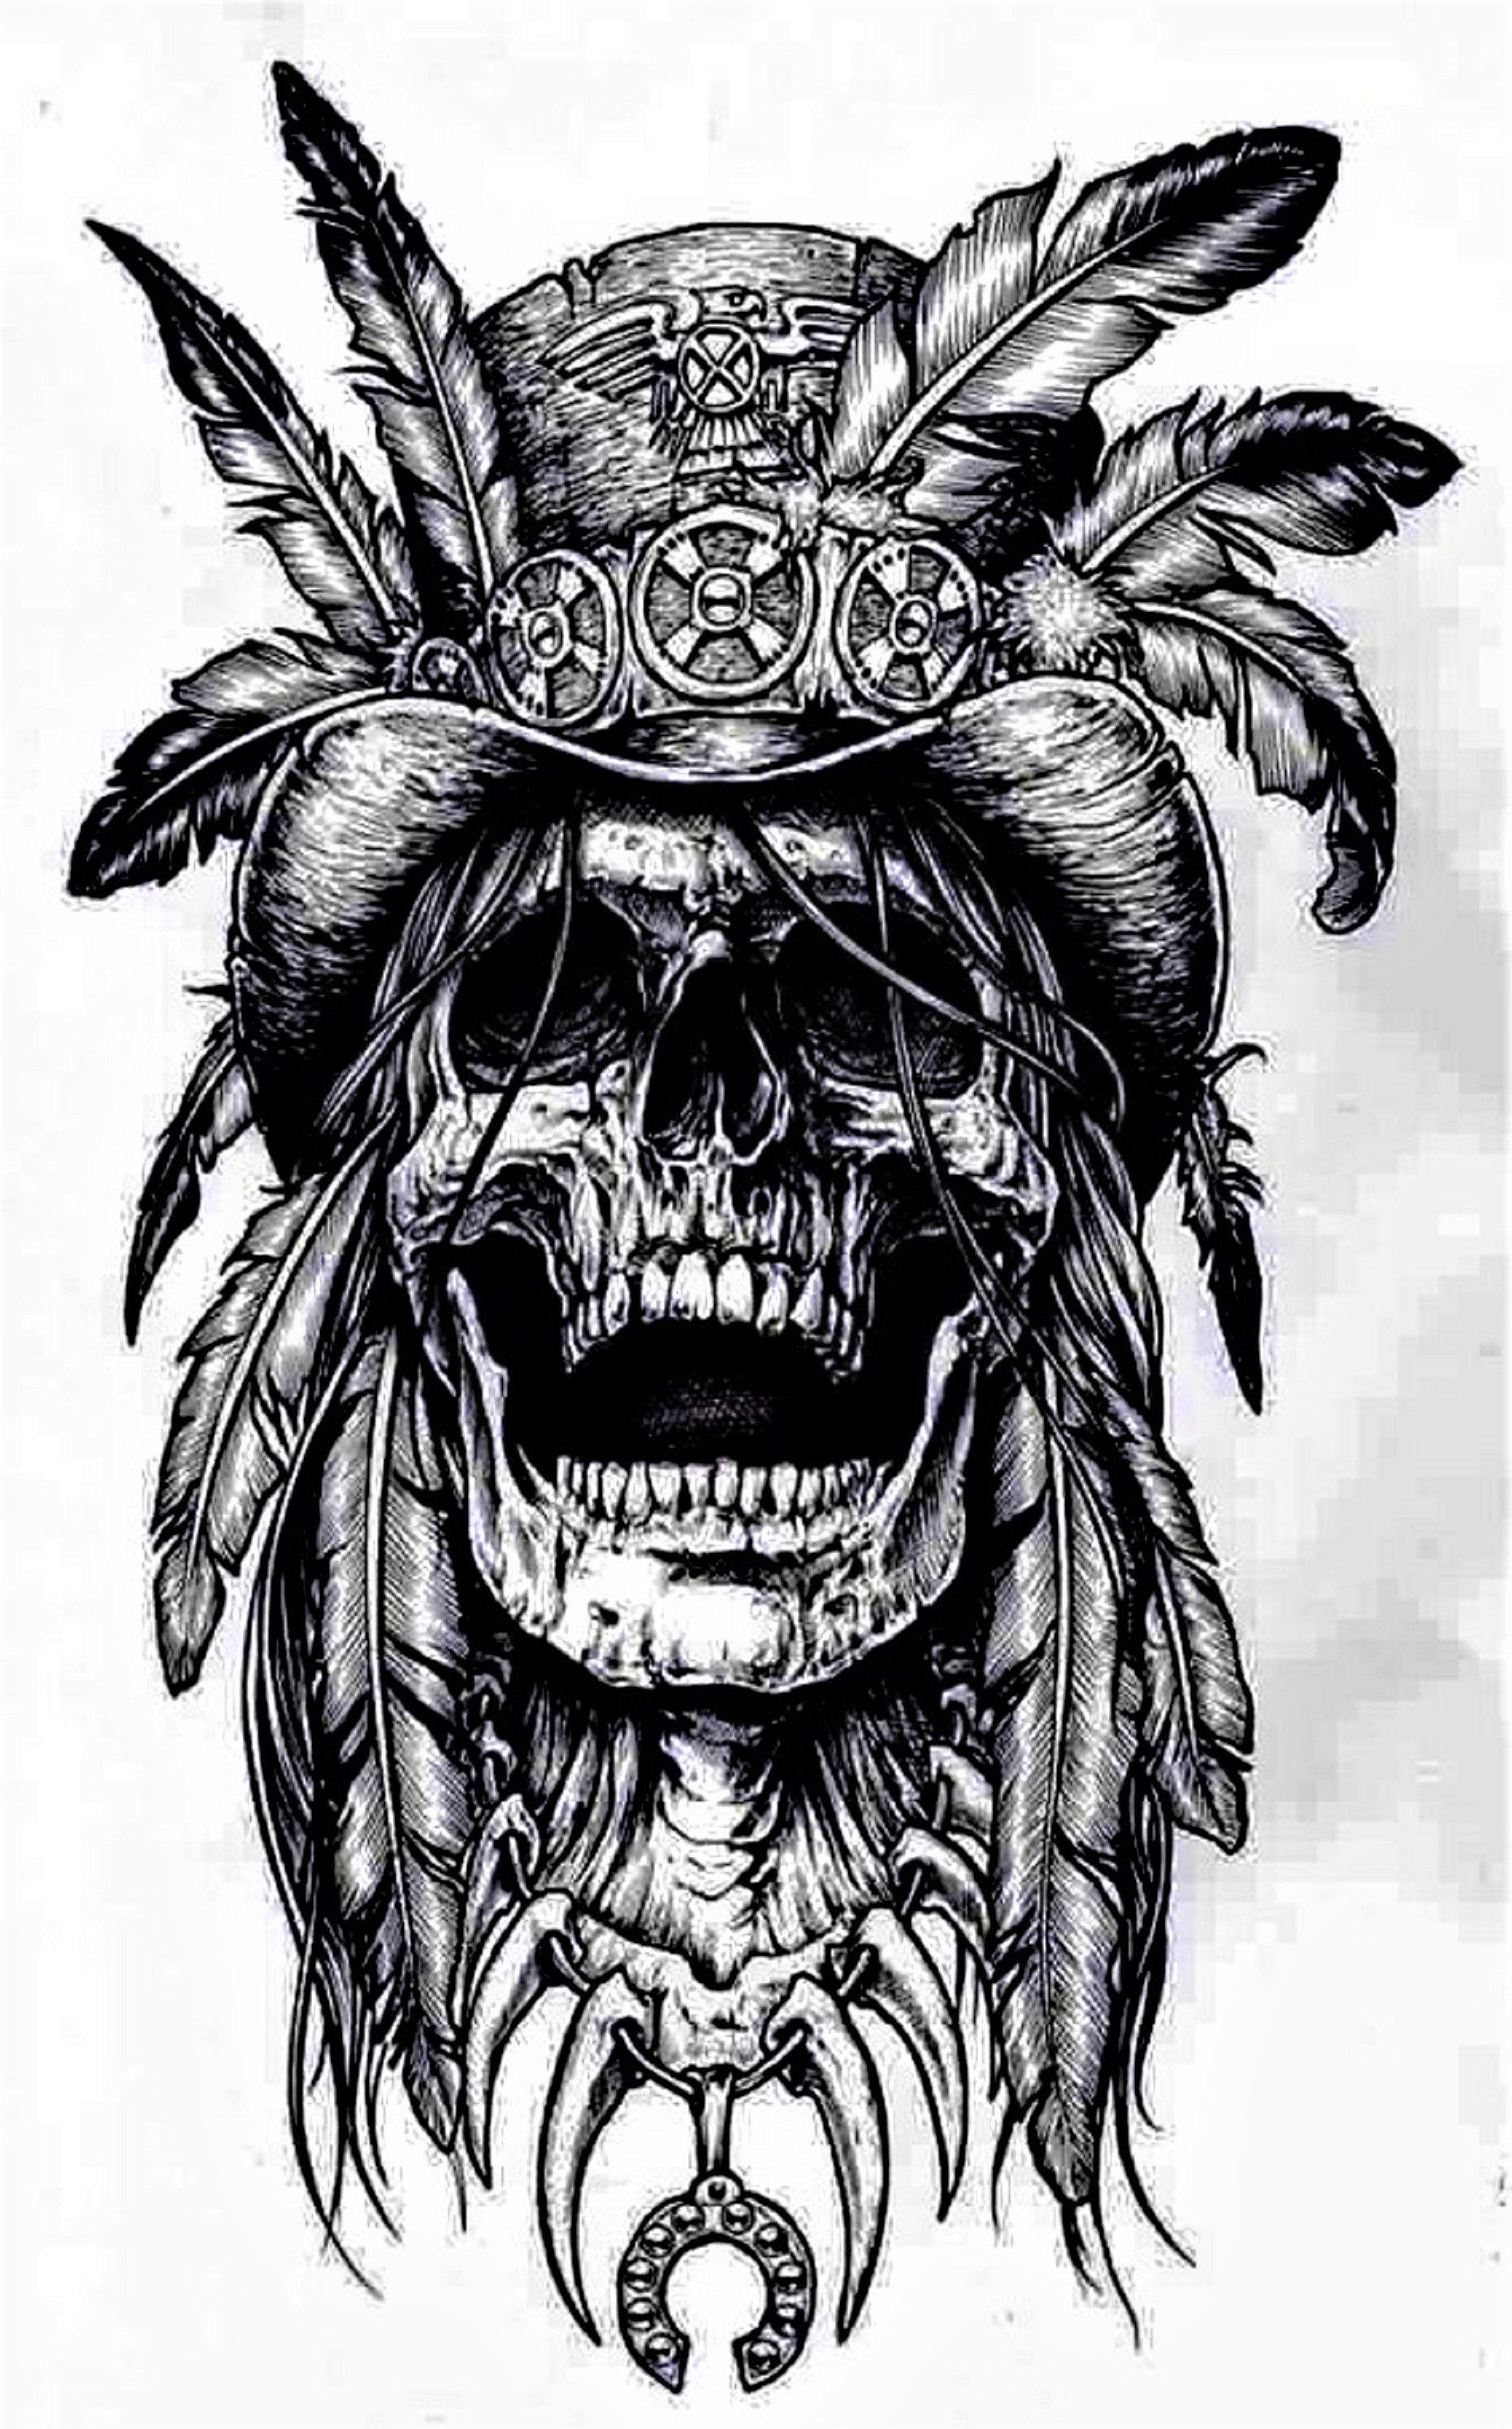 Skull With Head Dress Native American Tattoo Design Skull Symbol Of Death And Decay Skull Tattoo Design Abstract Tattoo Death Tattoo